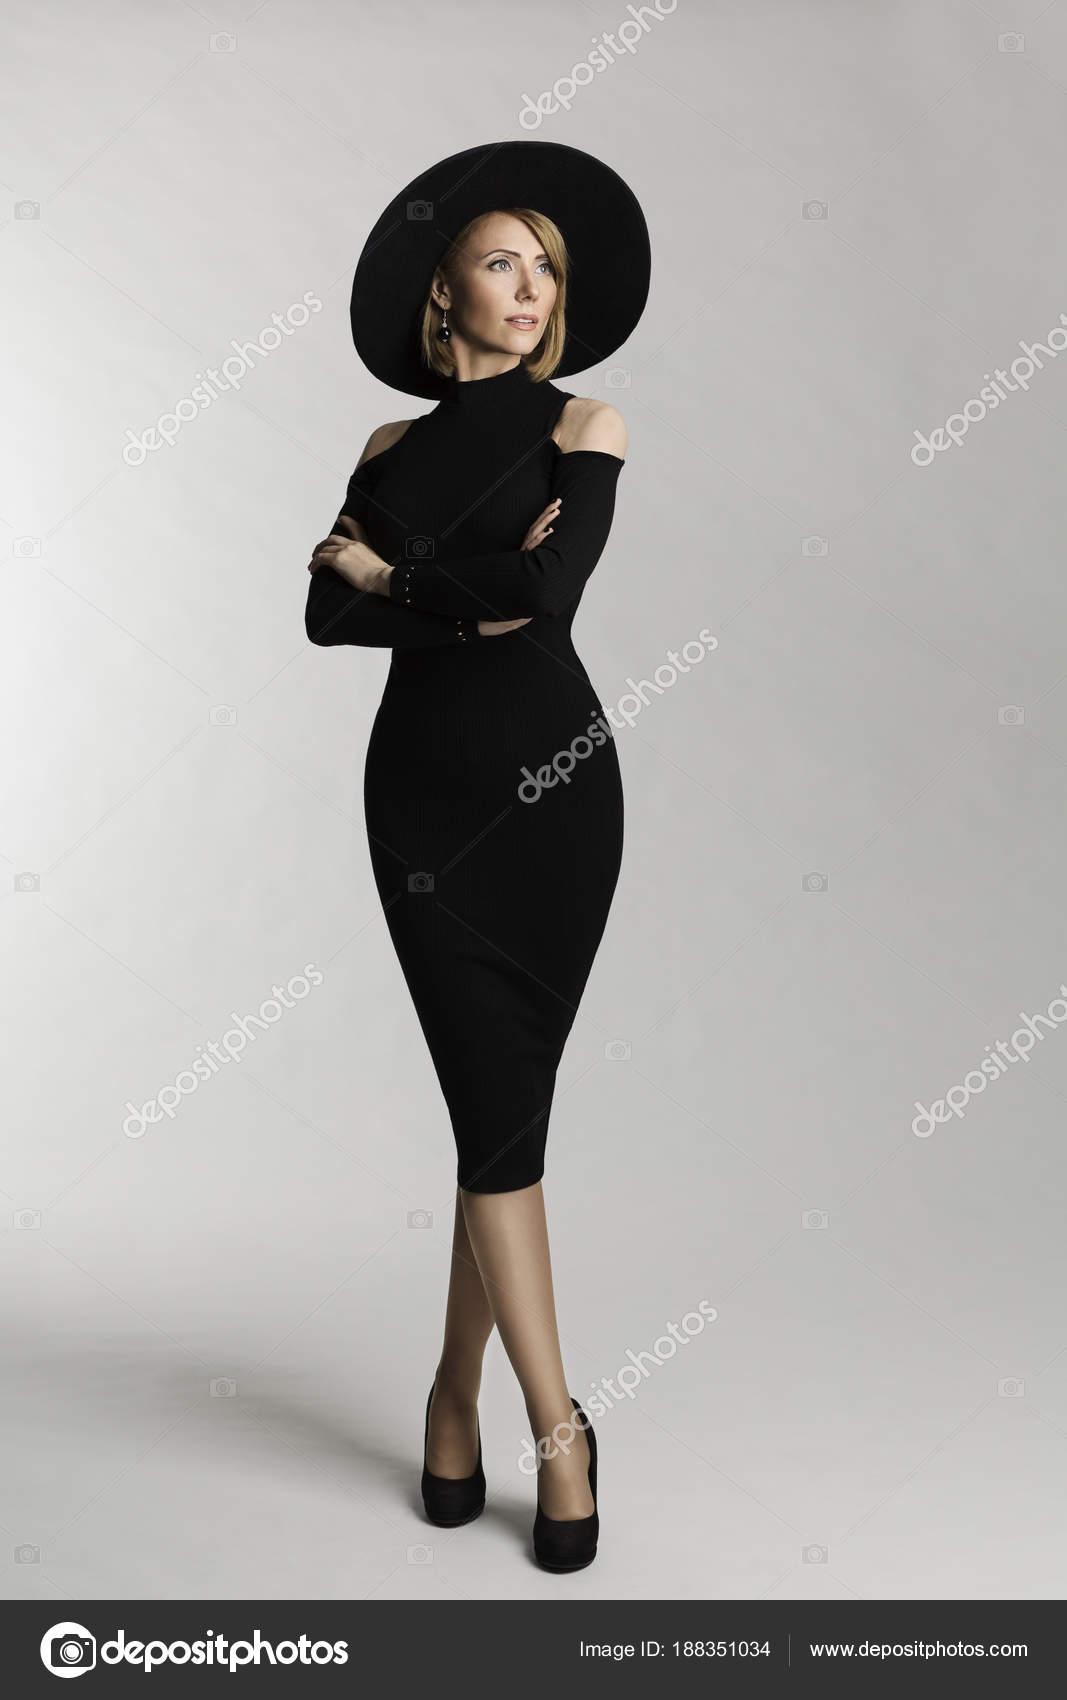 61d0832ecd16 Μόδα μοντέλο μακρύ φόρεμα